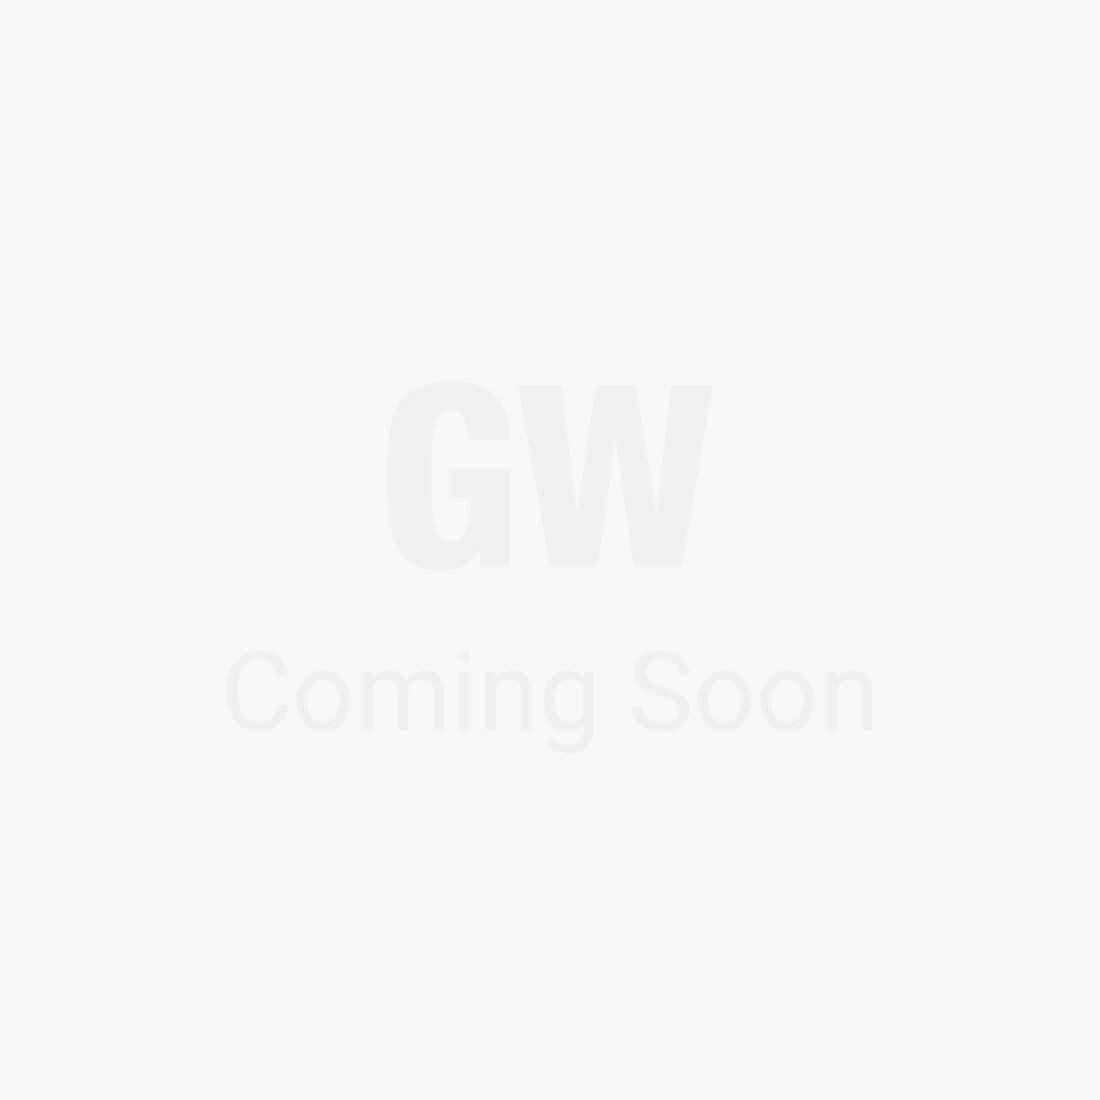 Natadora Starling Occasional Chair